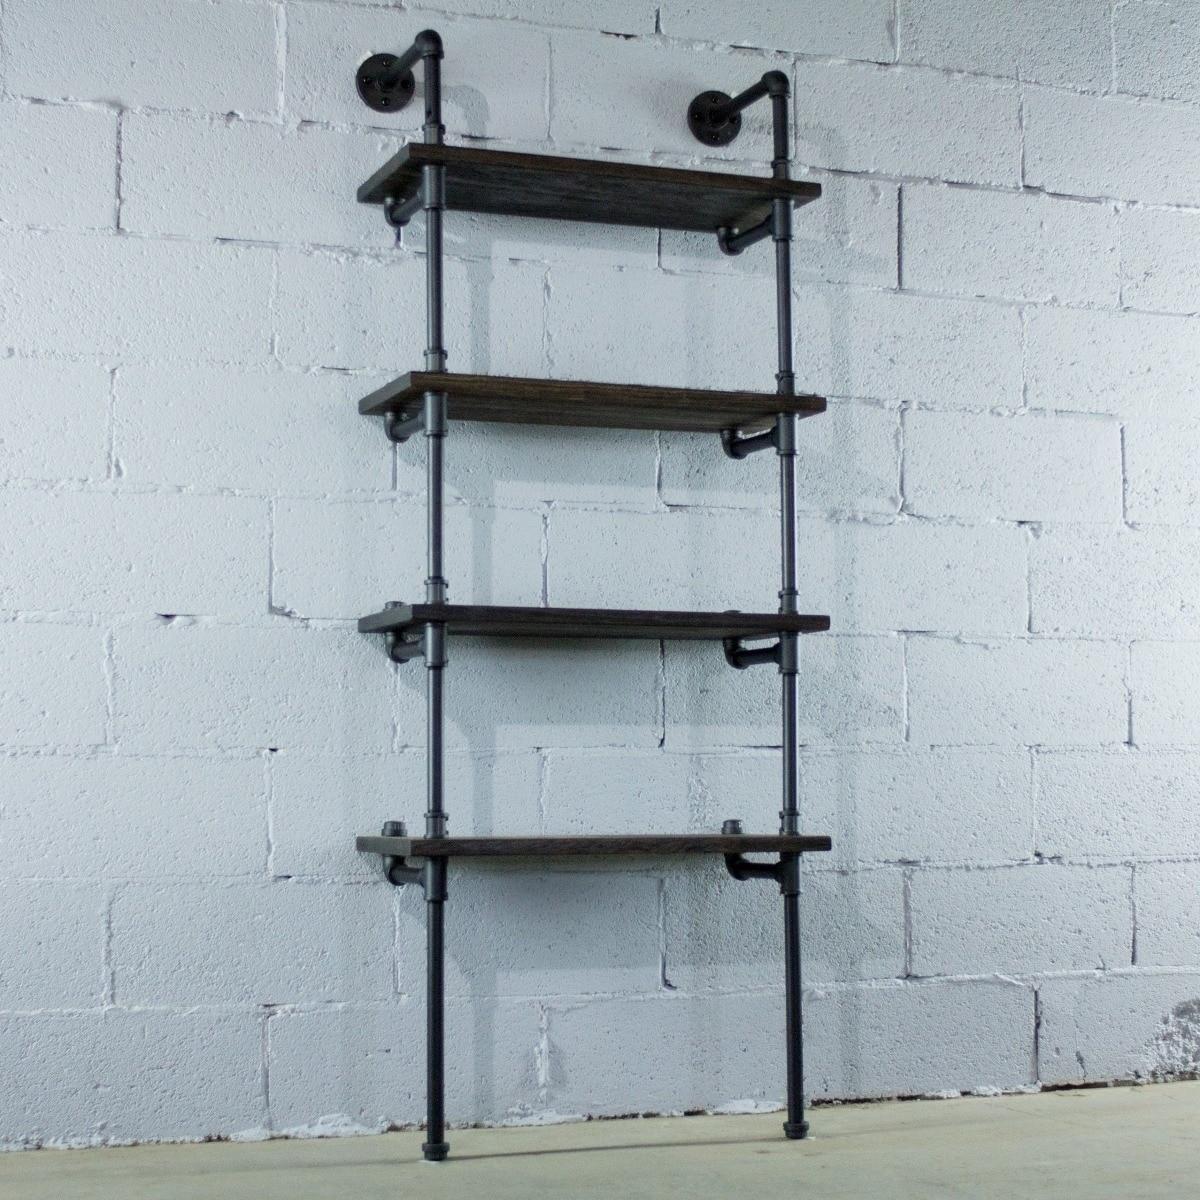 Furniture Pipeline Sacramento 4 Shelf 27 Inch 33 Inch Wide Etagere Pipe Bookcase Display